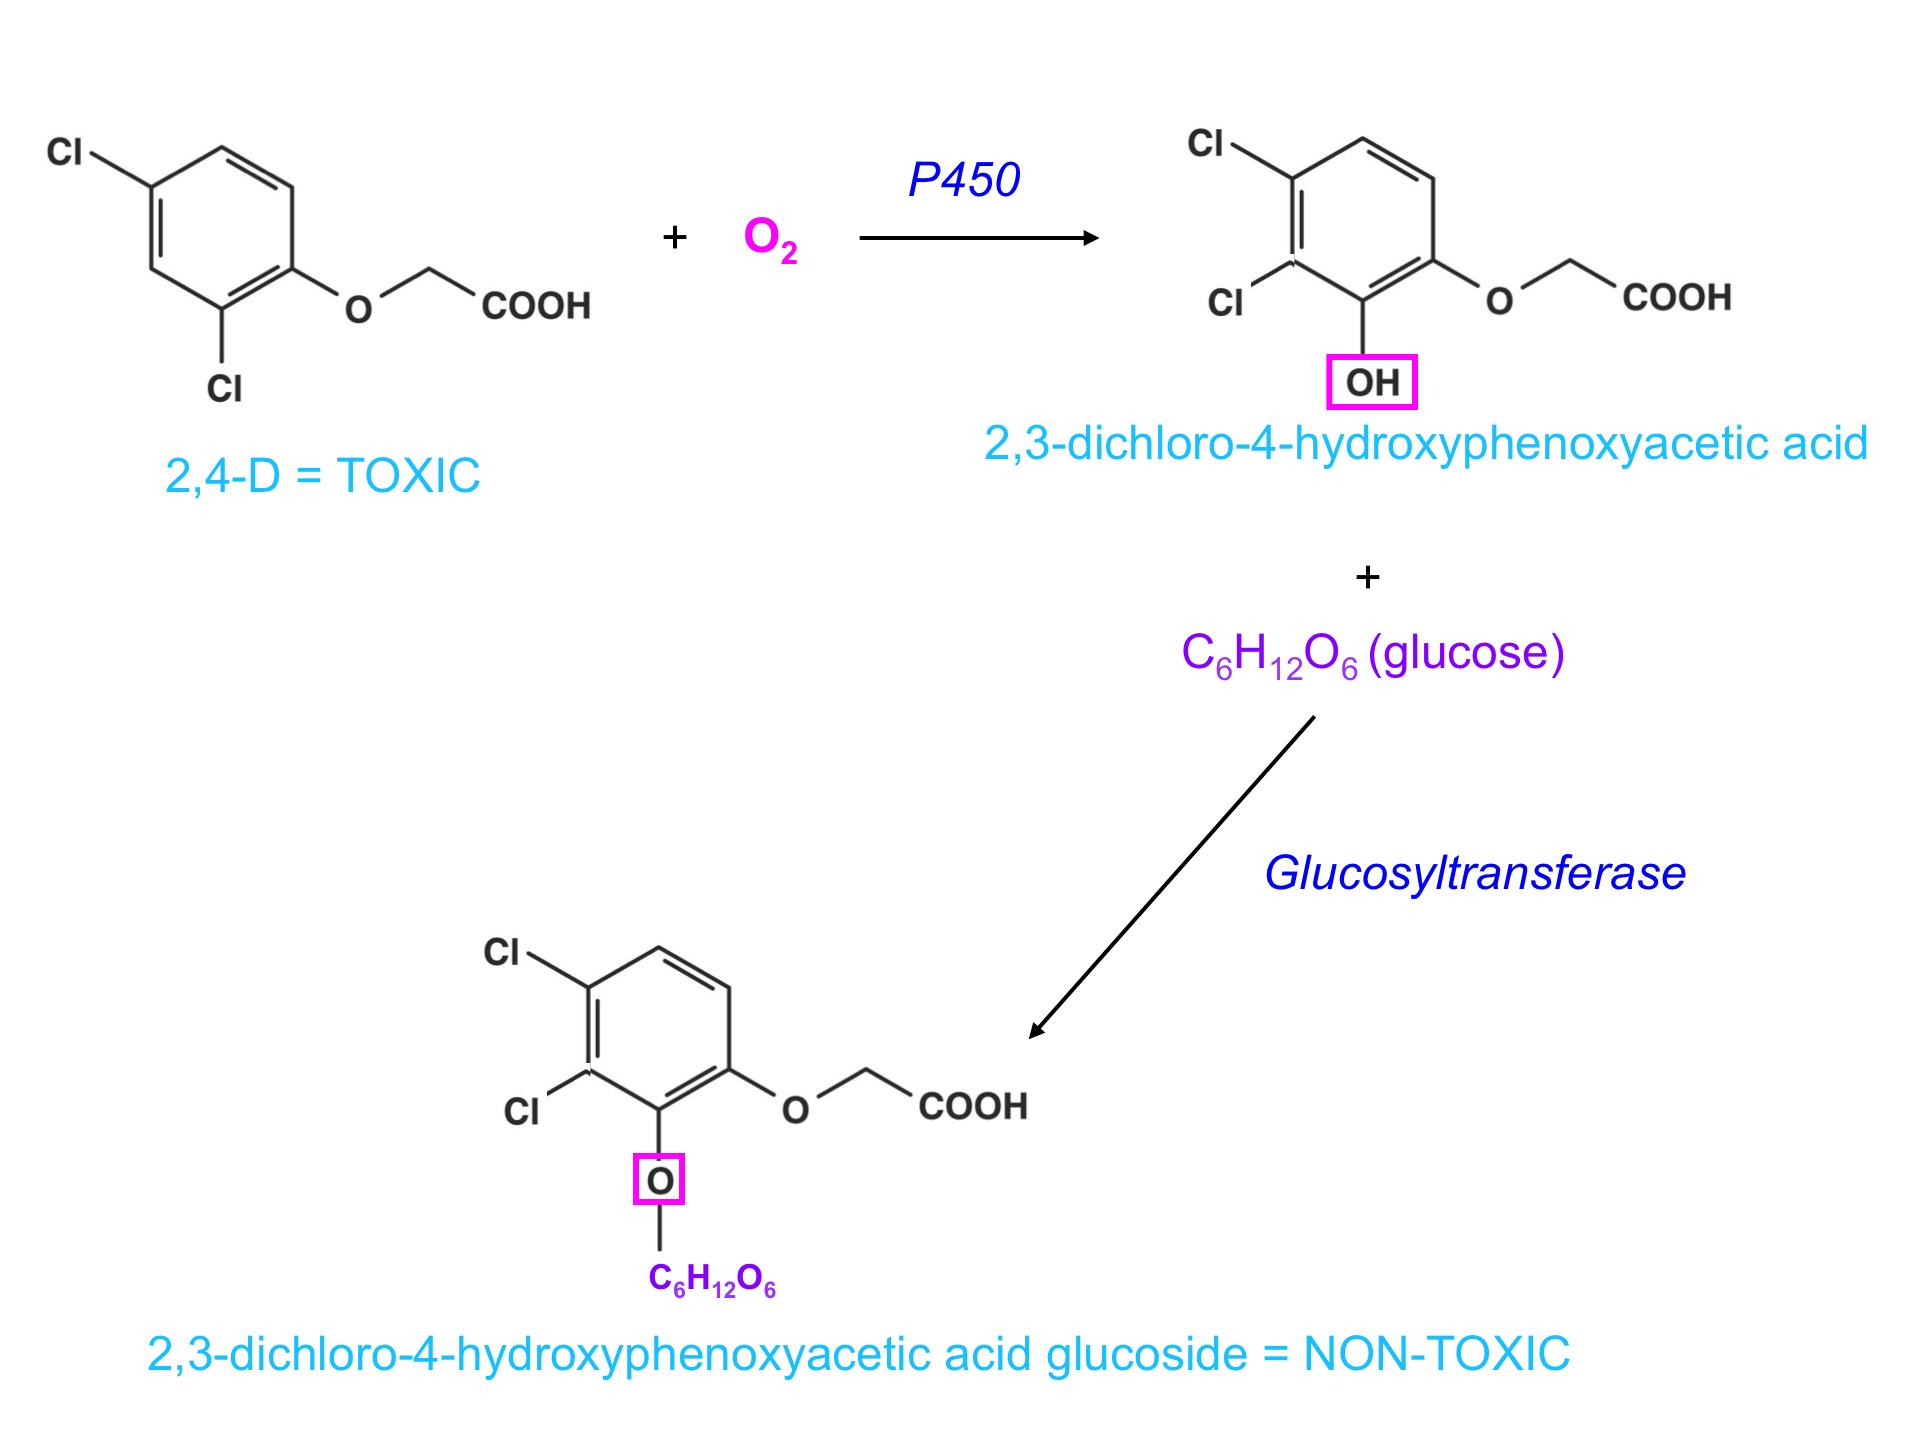 2,4-D metabolism graphic (toxic vs non-toxic)